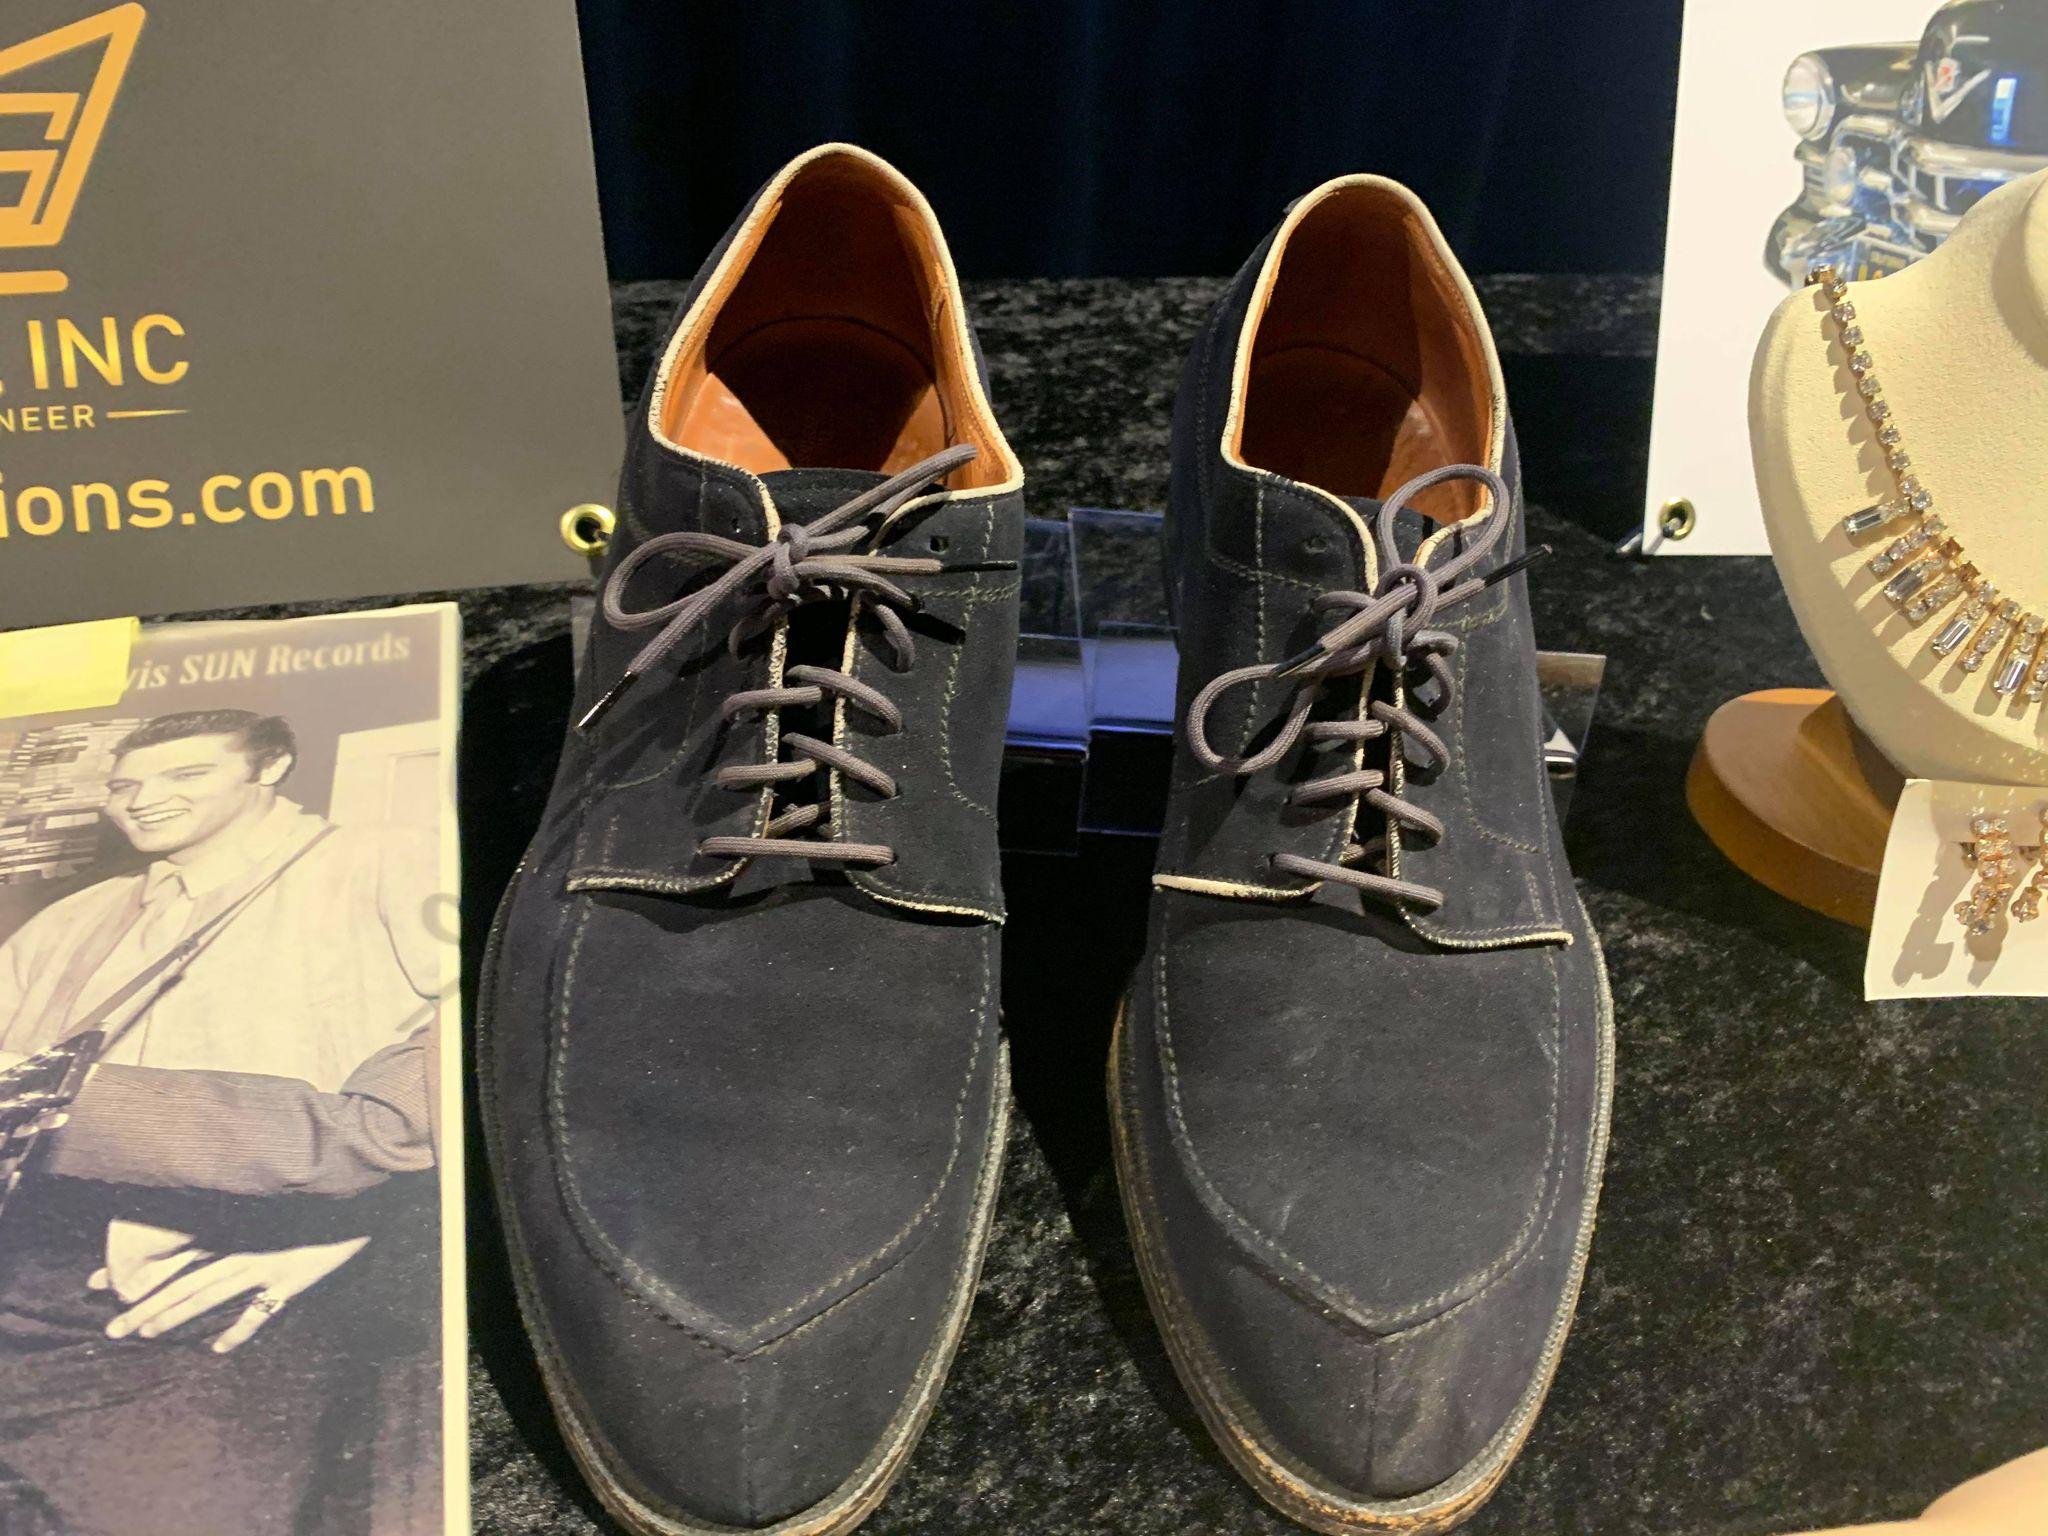 Kruse GWS Auctions: Carl Perkins Blue Suede Shoes